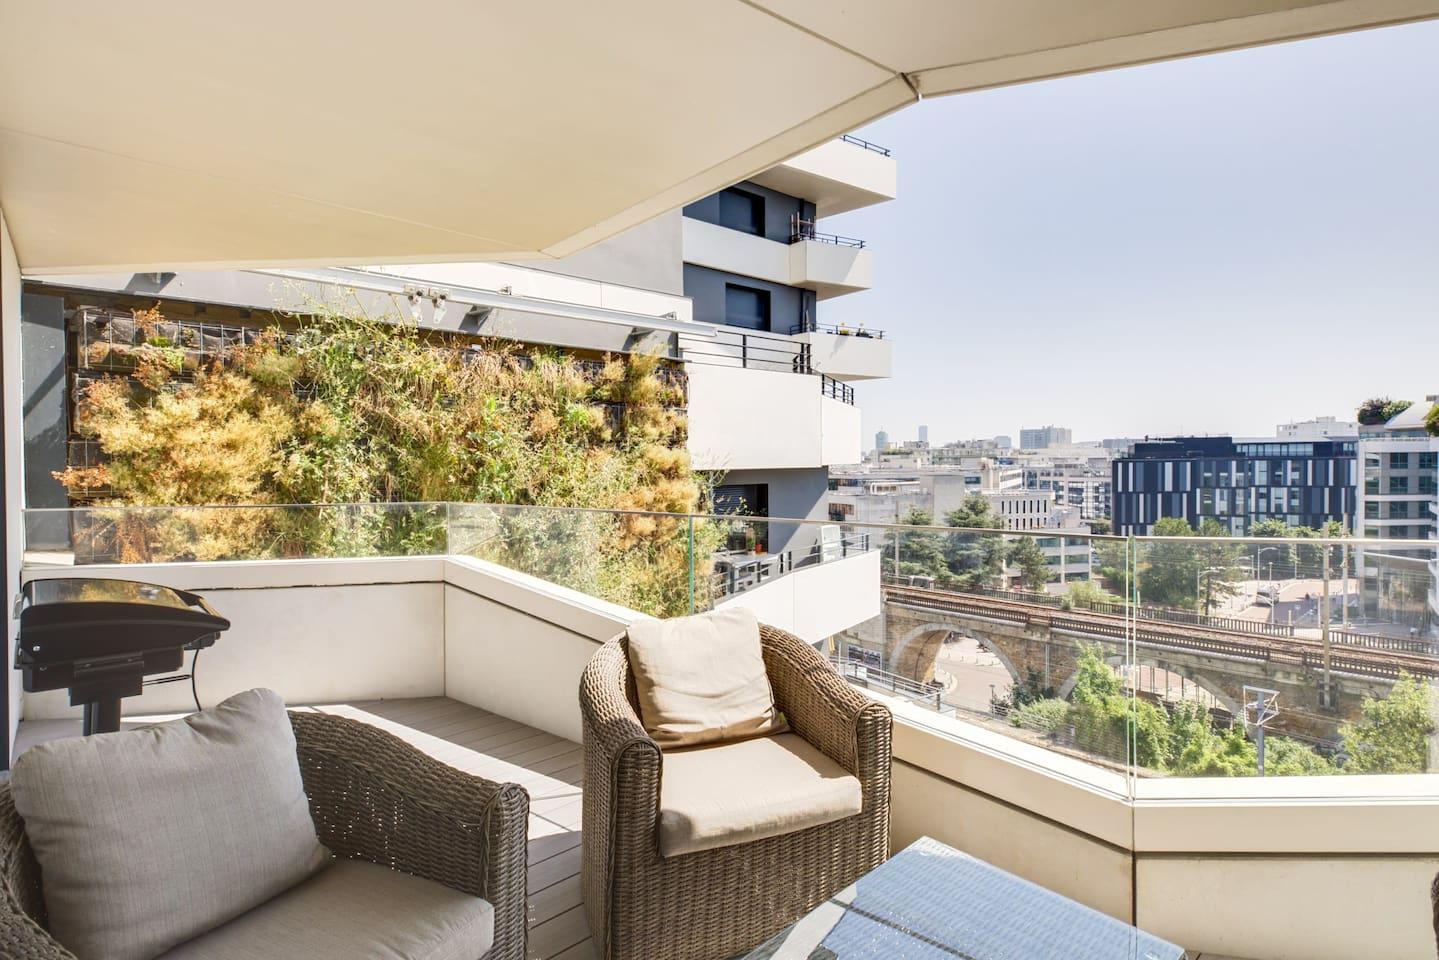 Pleasant terrace